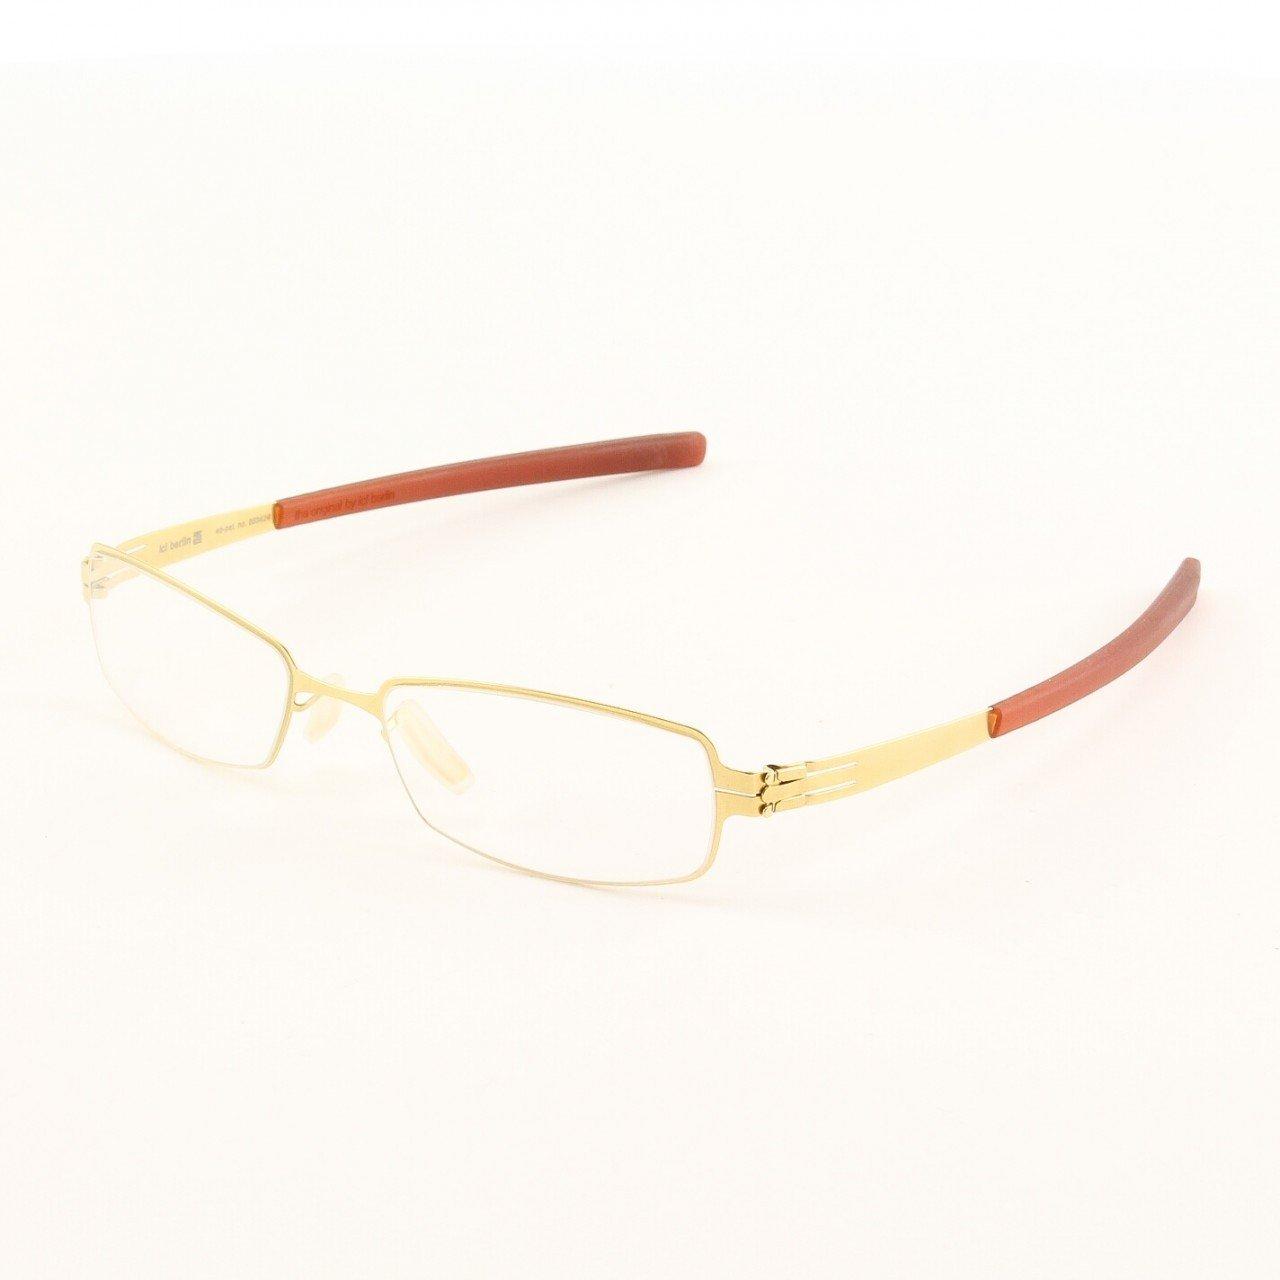 ic! Berlin Kolja Eyeglasses Col. Gold/rust with Clear Lenses